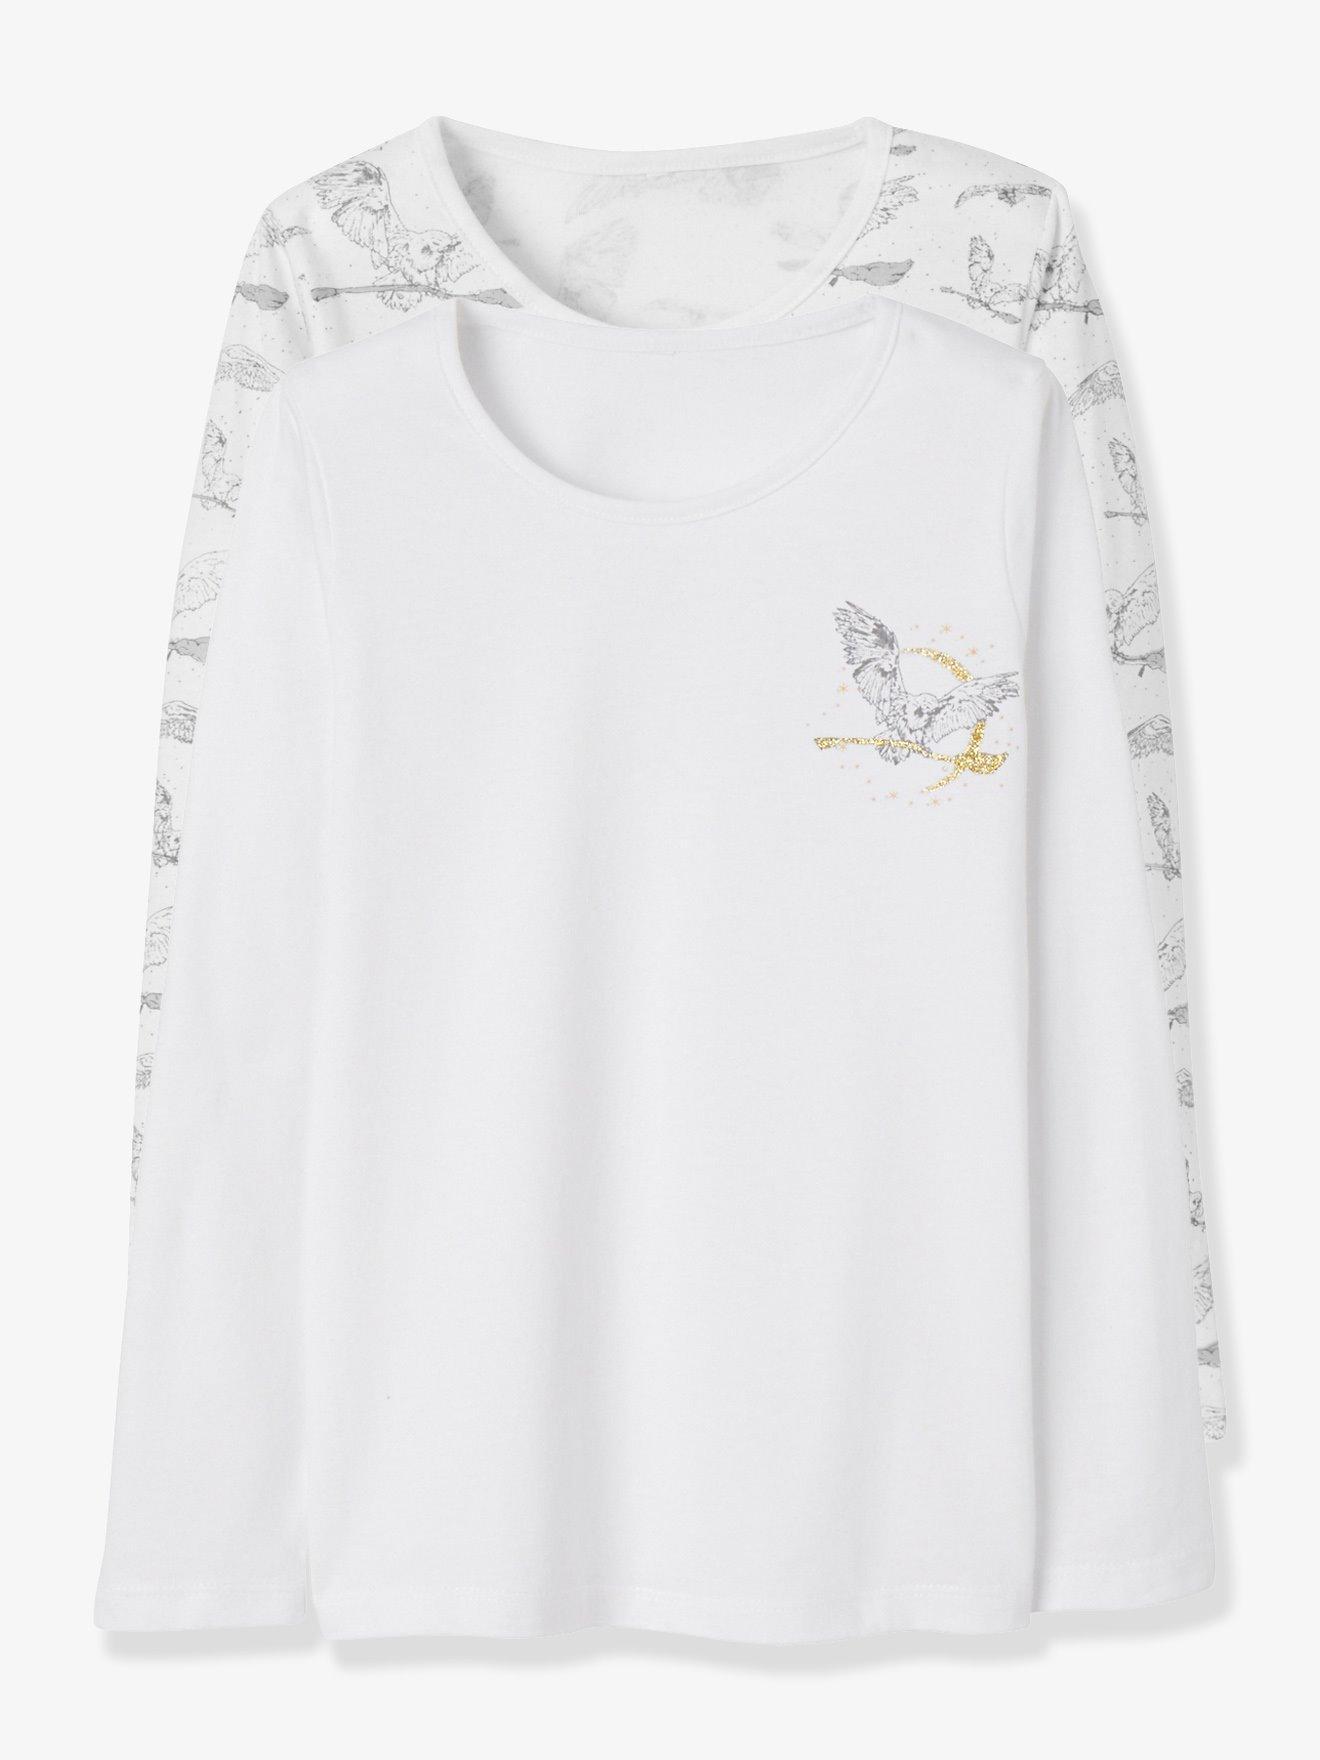 f05987f75 Lote de 2 camisetas para niña harry potter® de manga larga blanco medio  liso con motivos. Vertbaudet